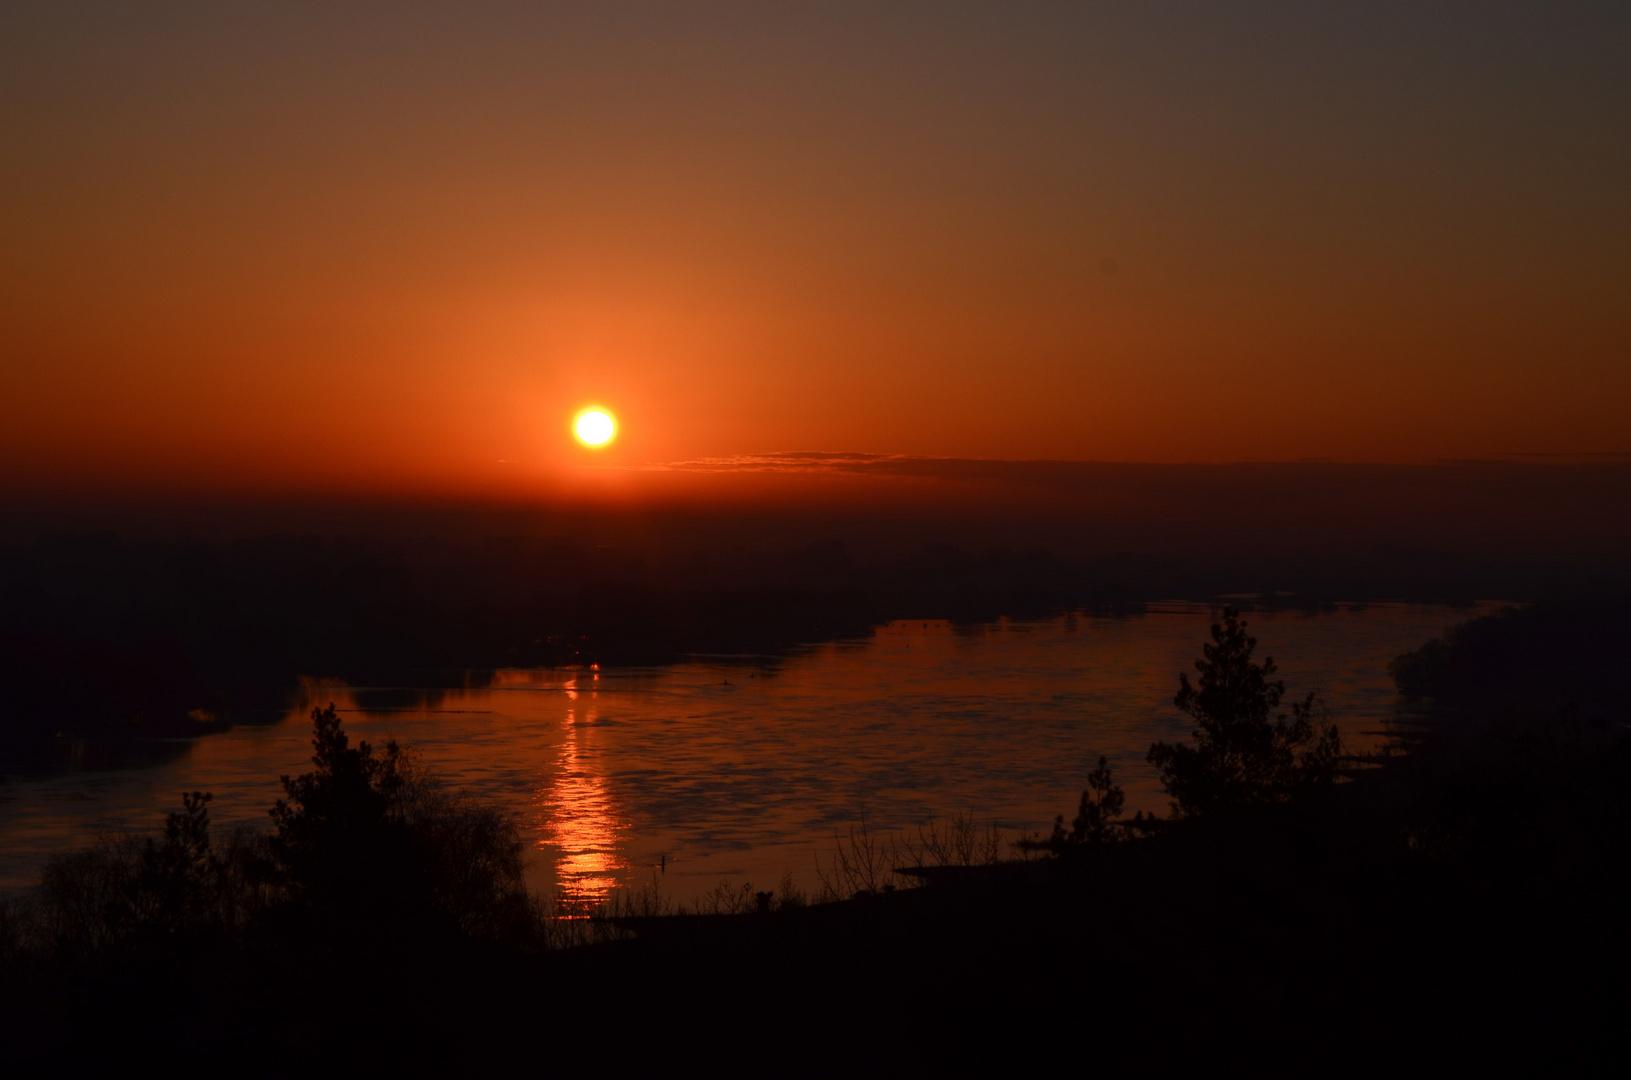 Sonnenaufgang - Ostersonntag 08.04.2012